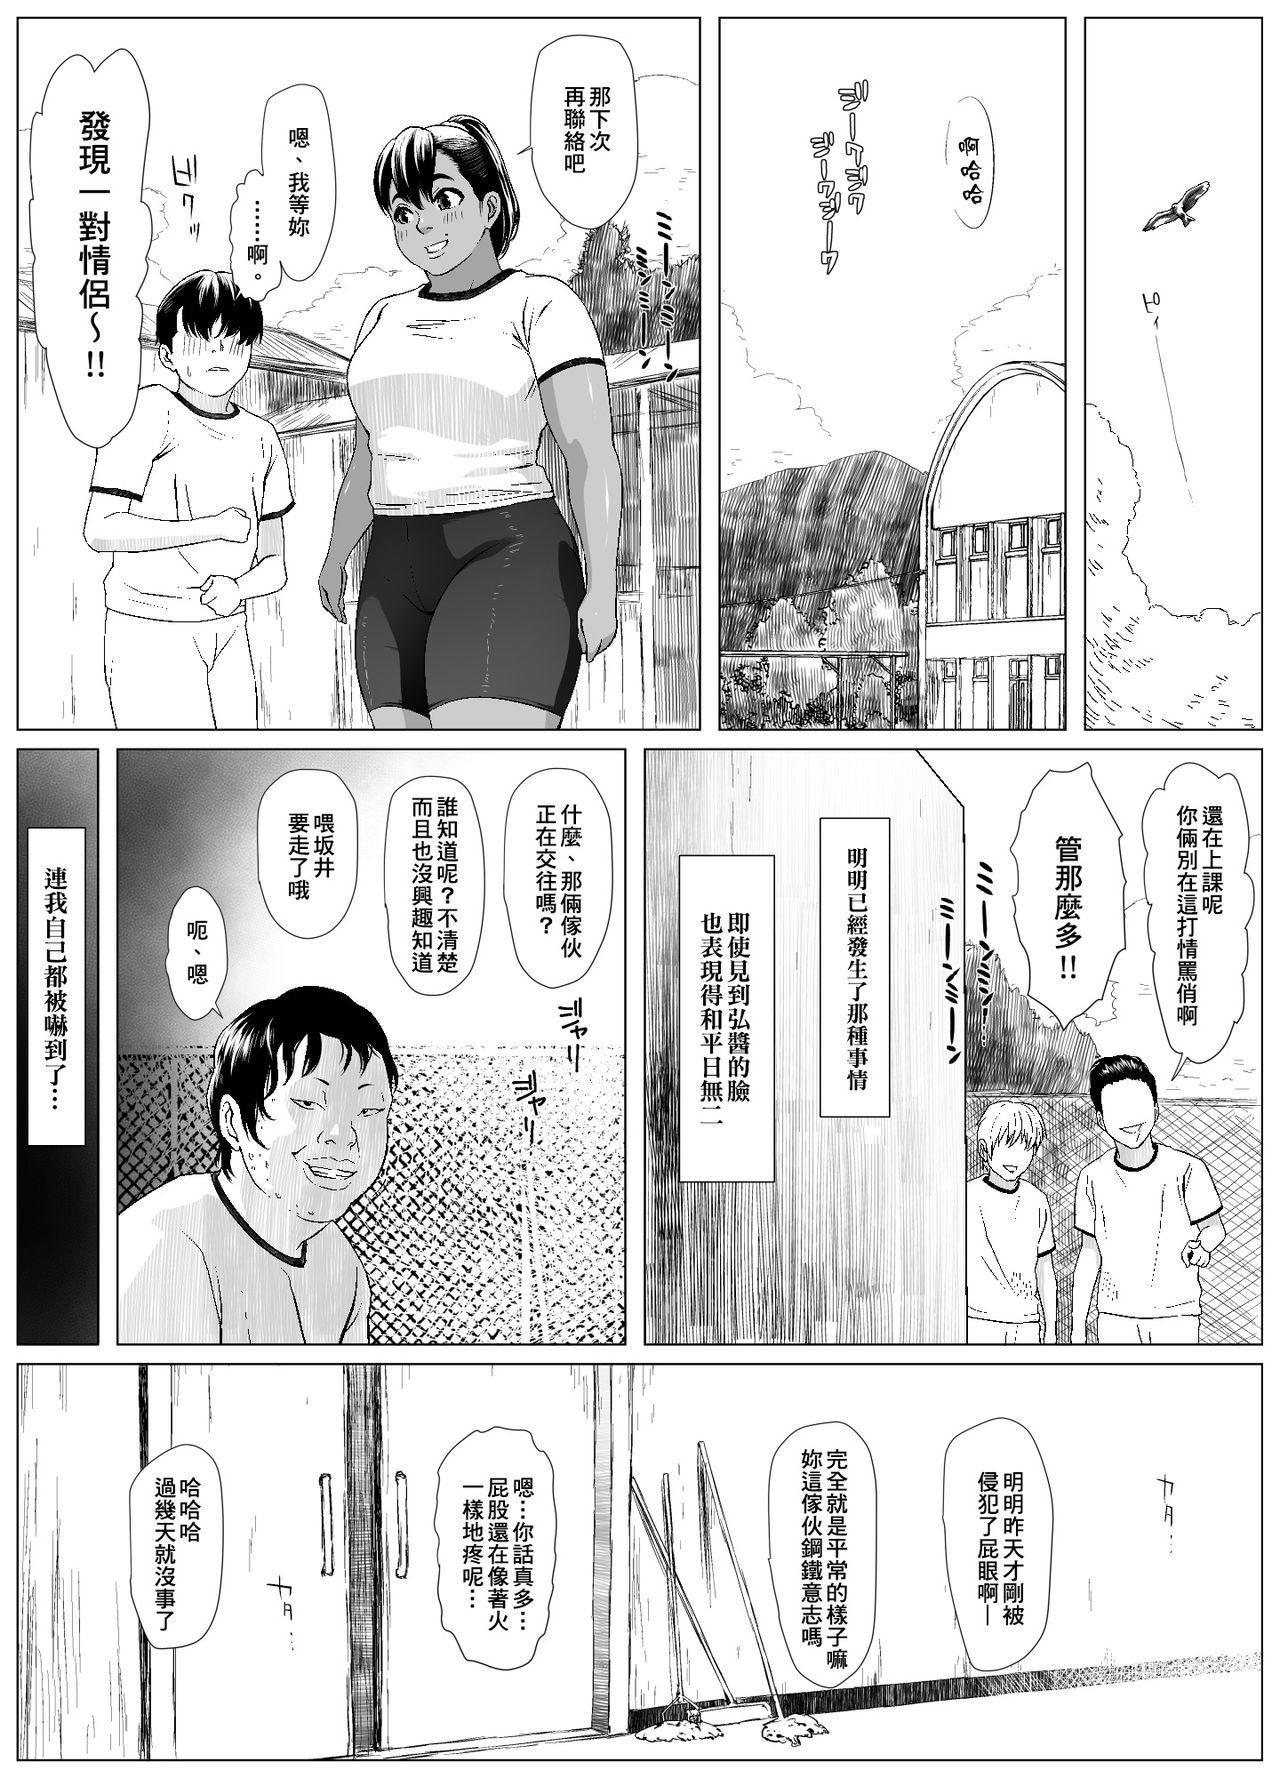 Koufukuron - Murase Ayumi Hen 1 24